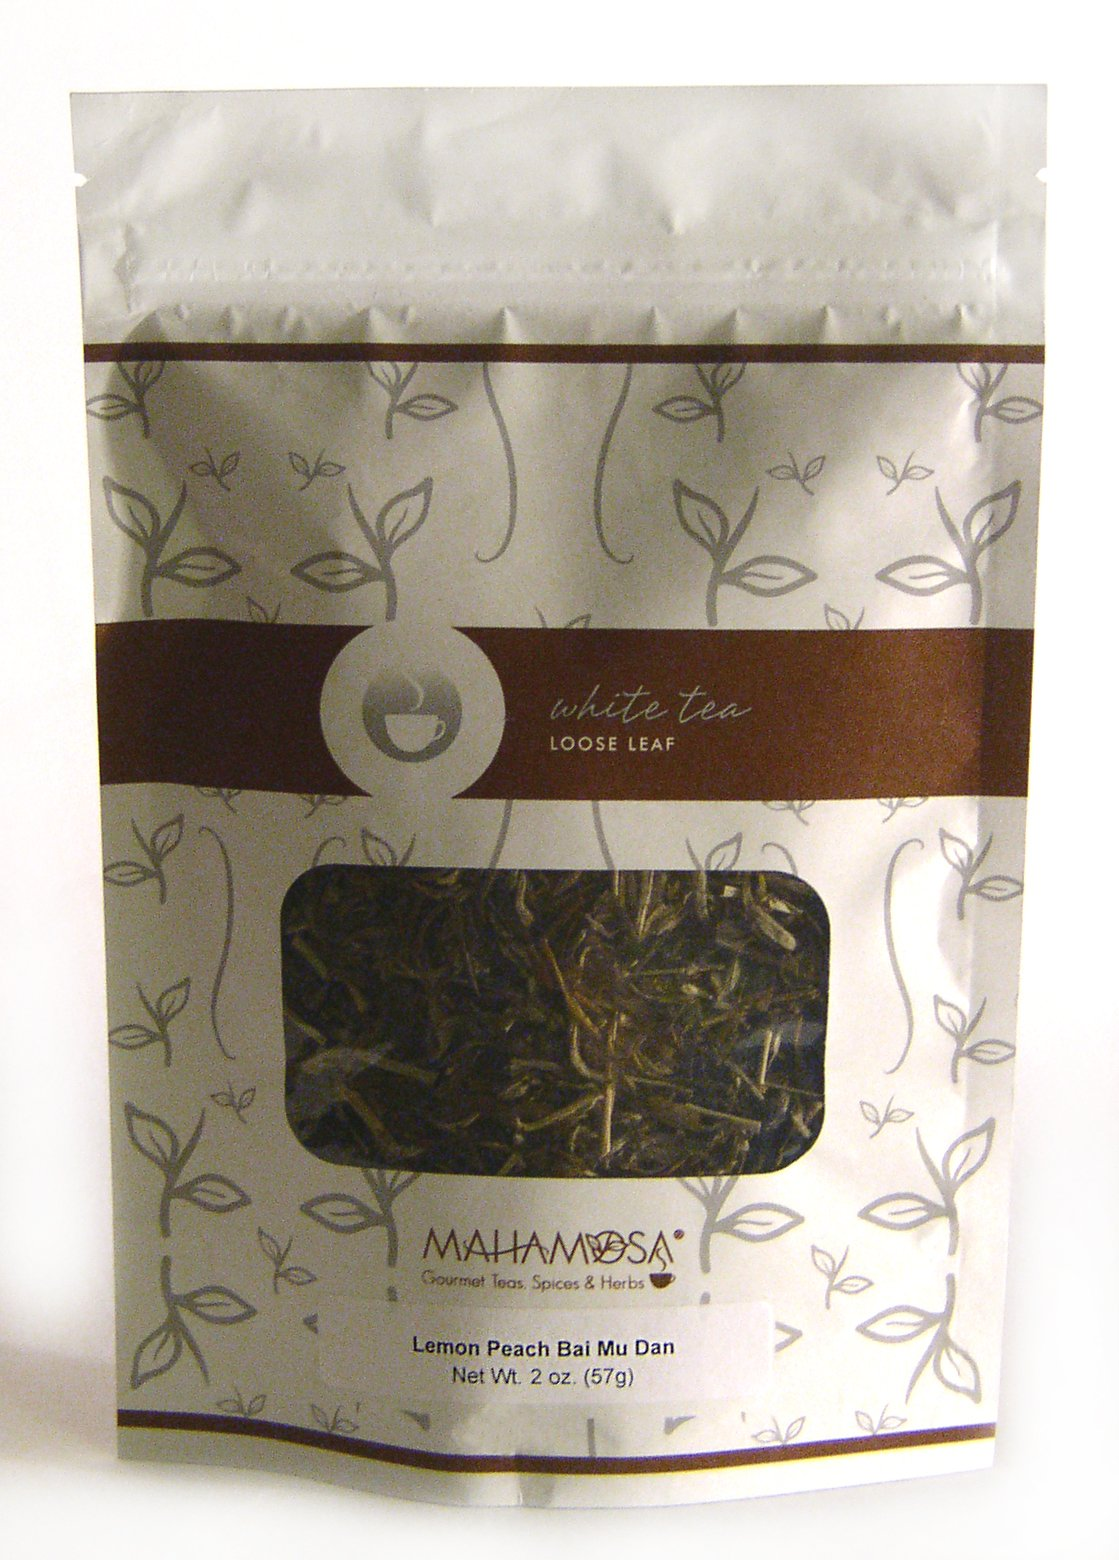 Mahamosa Lemon Peach White Tea (Bai Mu Dan) 2 oz, Loose Leaf White Tea Blend (pai mu tan tea, bai mudan tea) (with lemongrass, peach pieces, peach flavor)